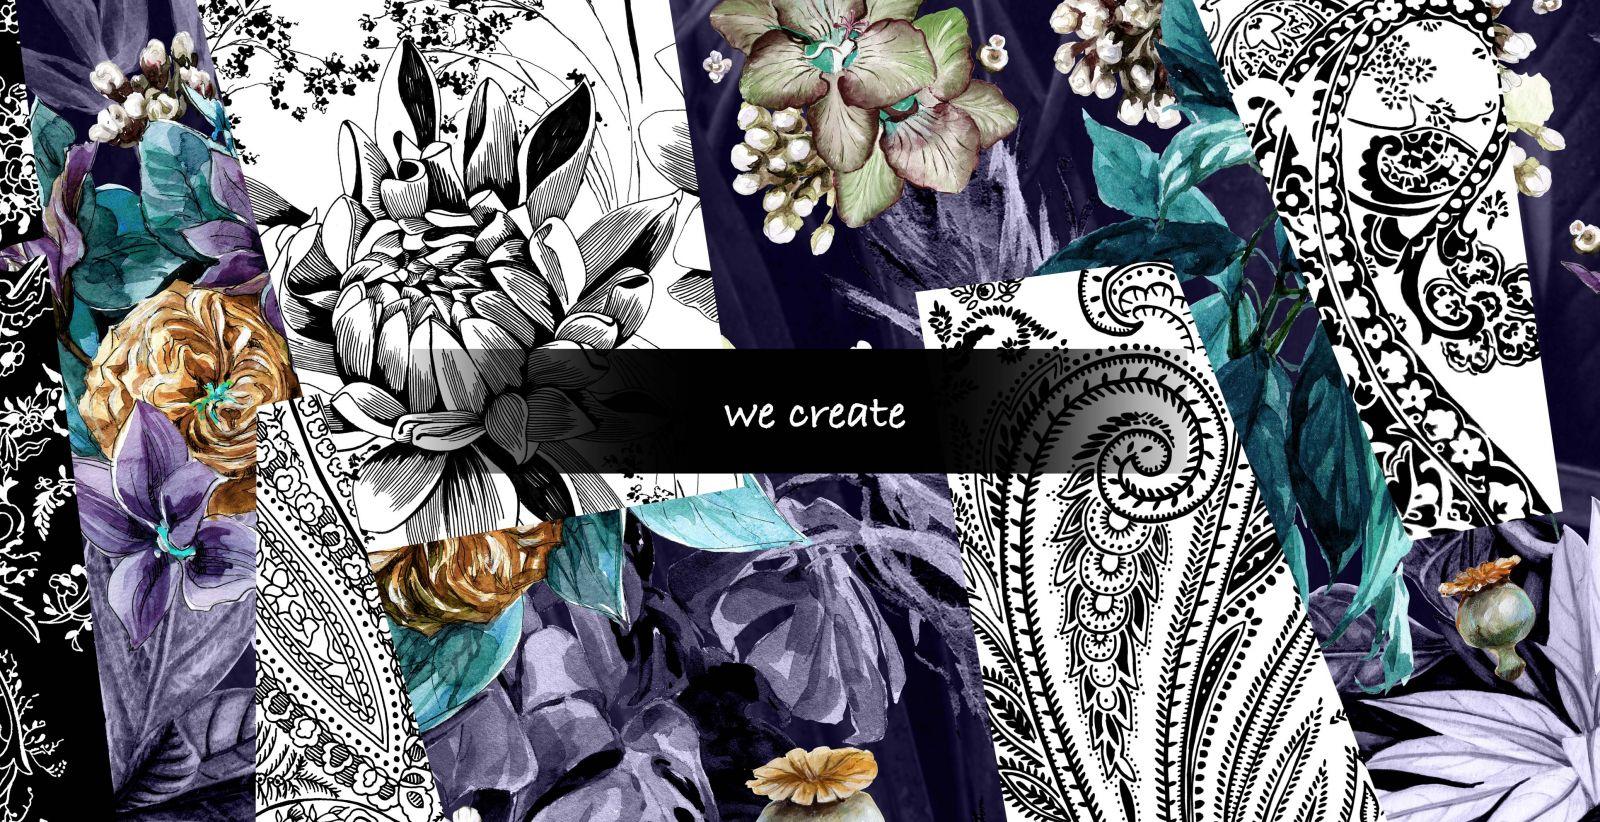 2We-create2